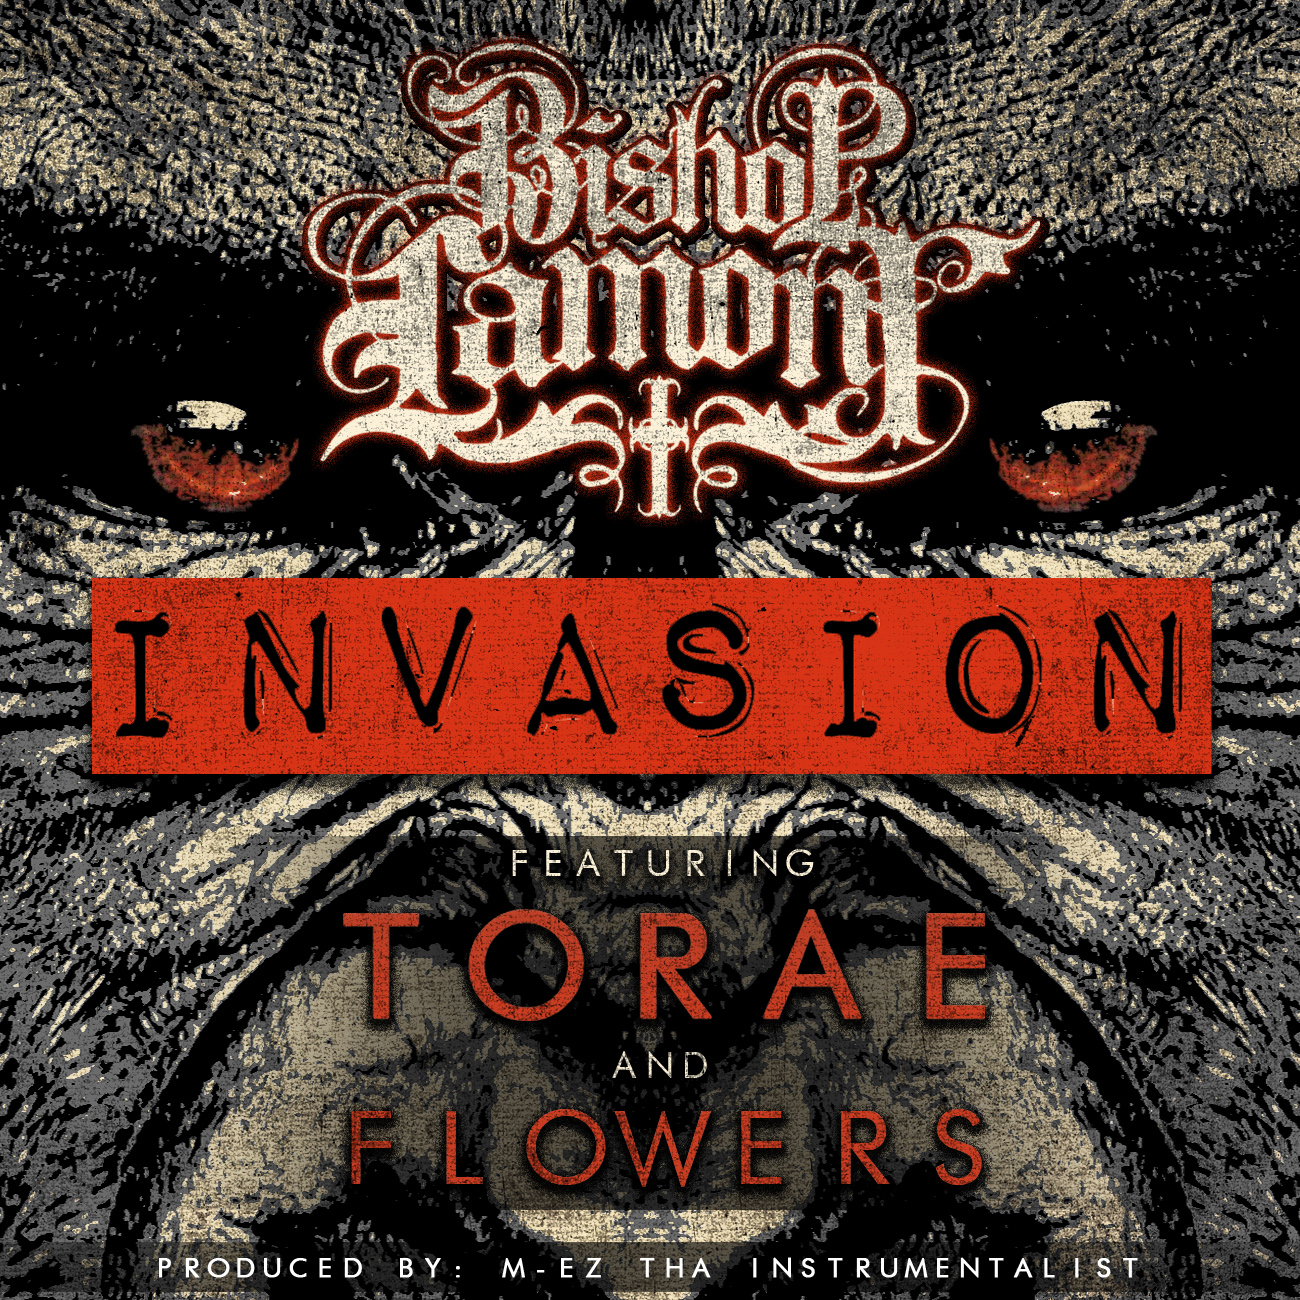 INVASION_COVER ART_LARGE.jpg